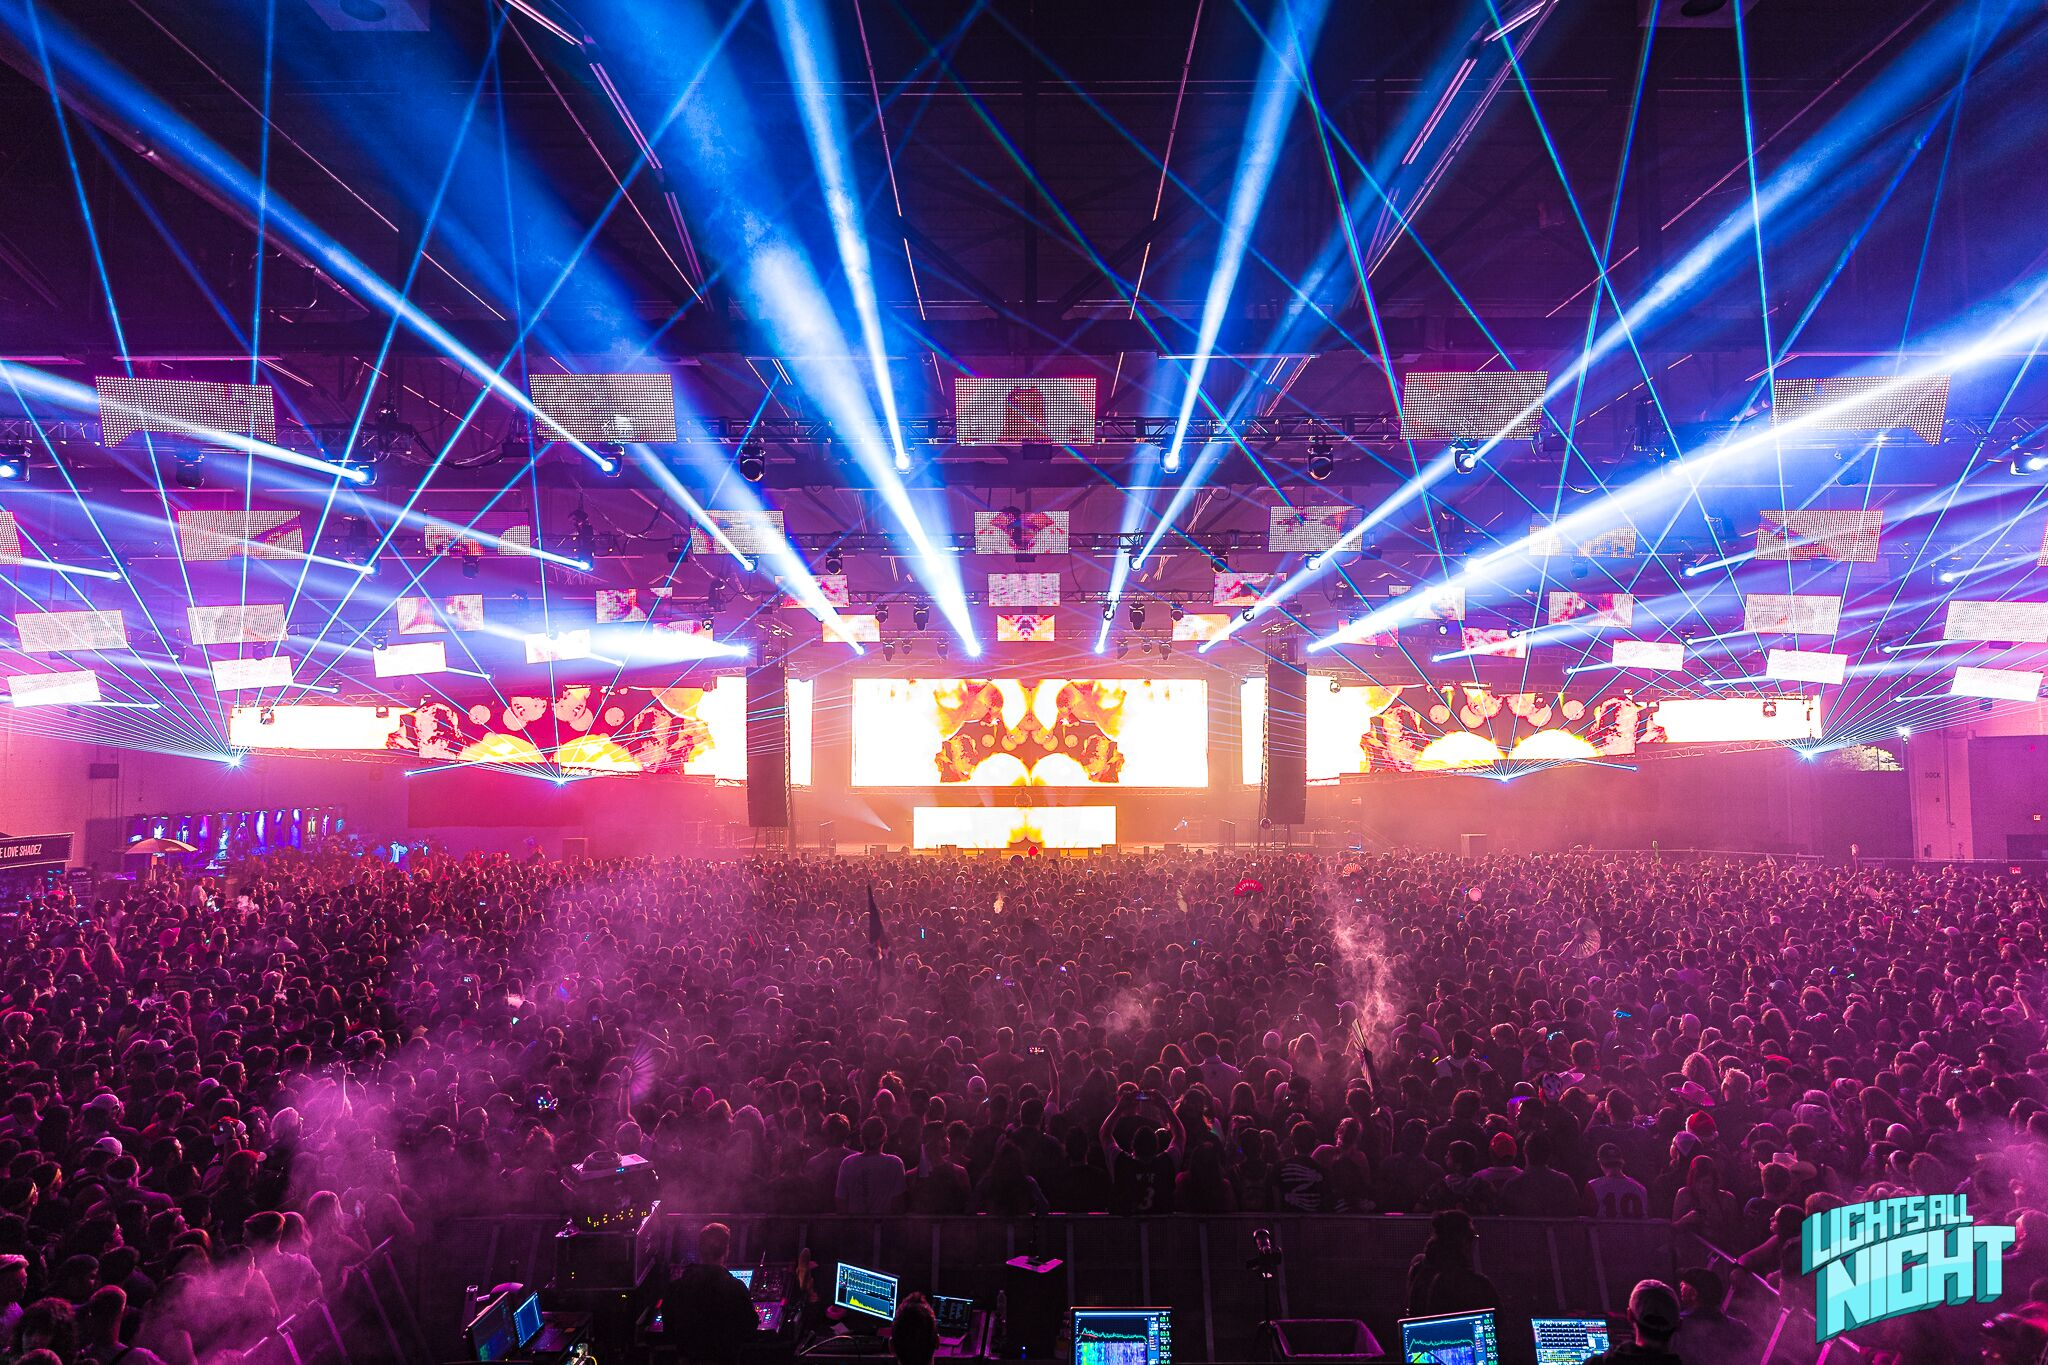 Lights All Night 2020